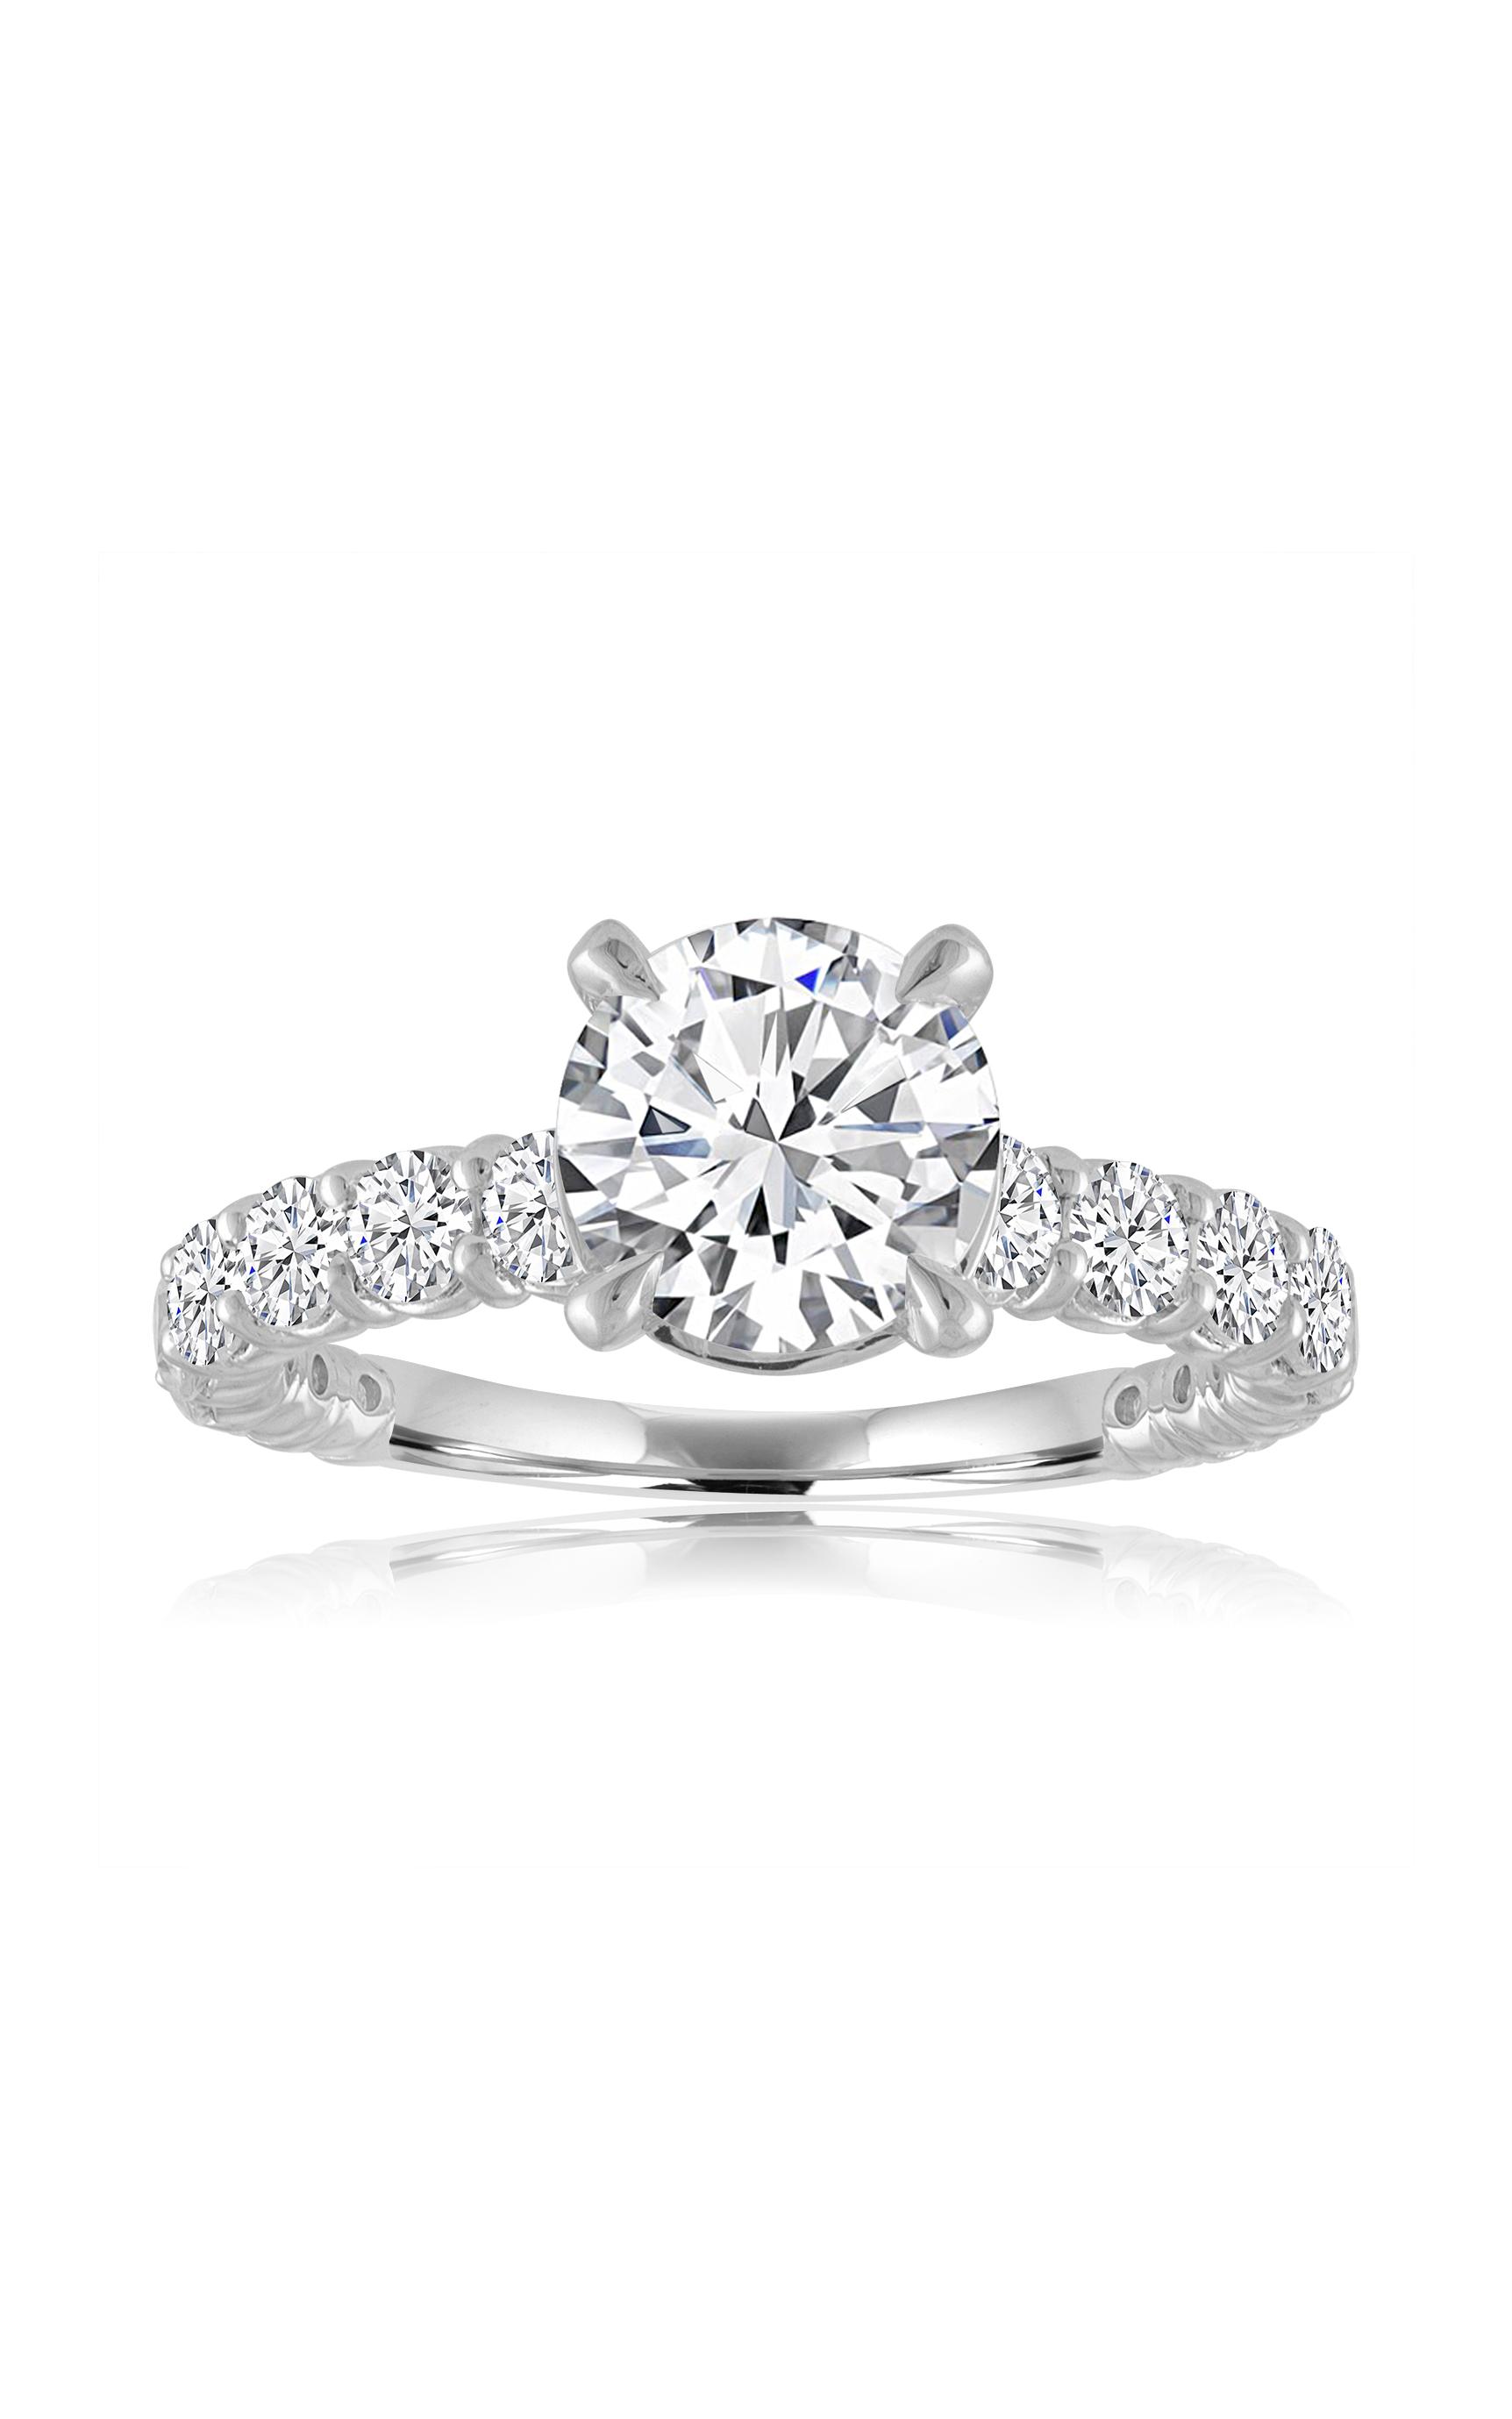 Imagine Bridal Engagement Rings 66196D-1 product image